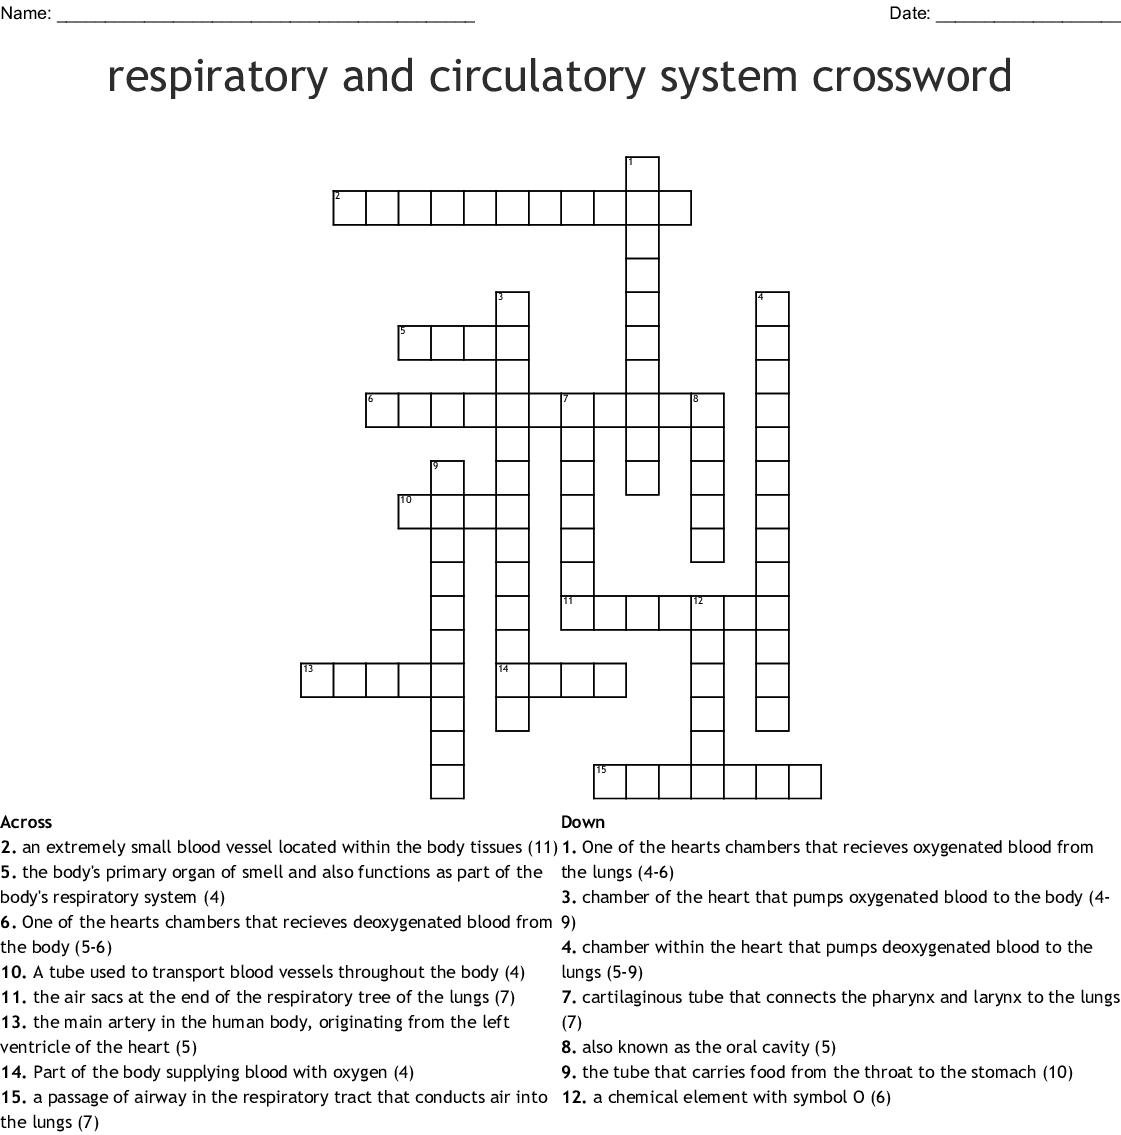 Crossword Respiratory System